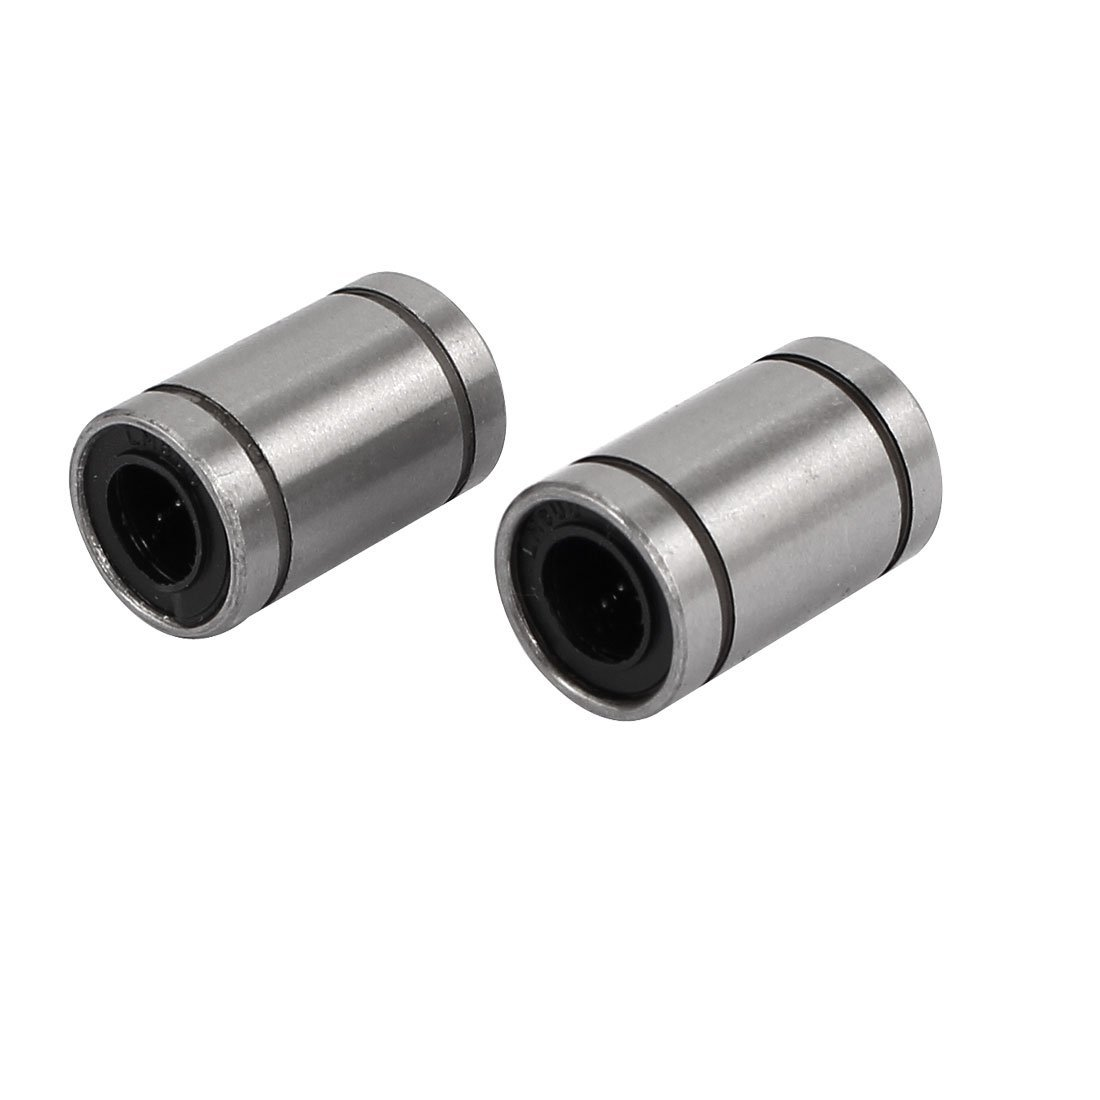 1-3//4 x 7//8 Keyway Lovejoy 69790444520 HERCUFLEX FX Series 44520 FX 5E Steel Rigid Hub Length Through Bore 6.03 6-3//4 Bore 10.24 OD